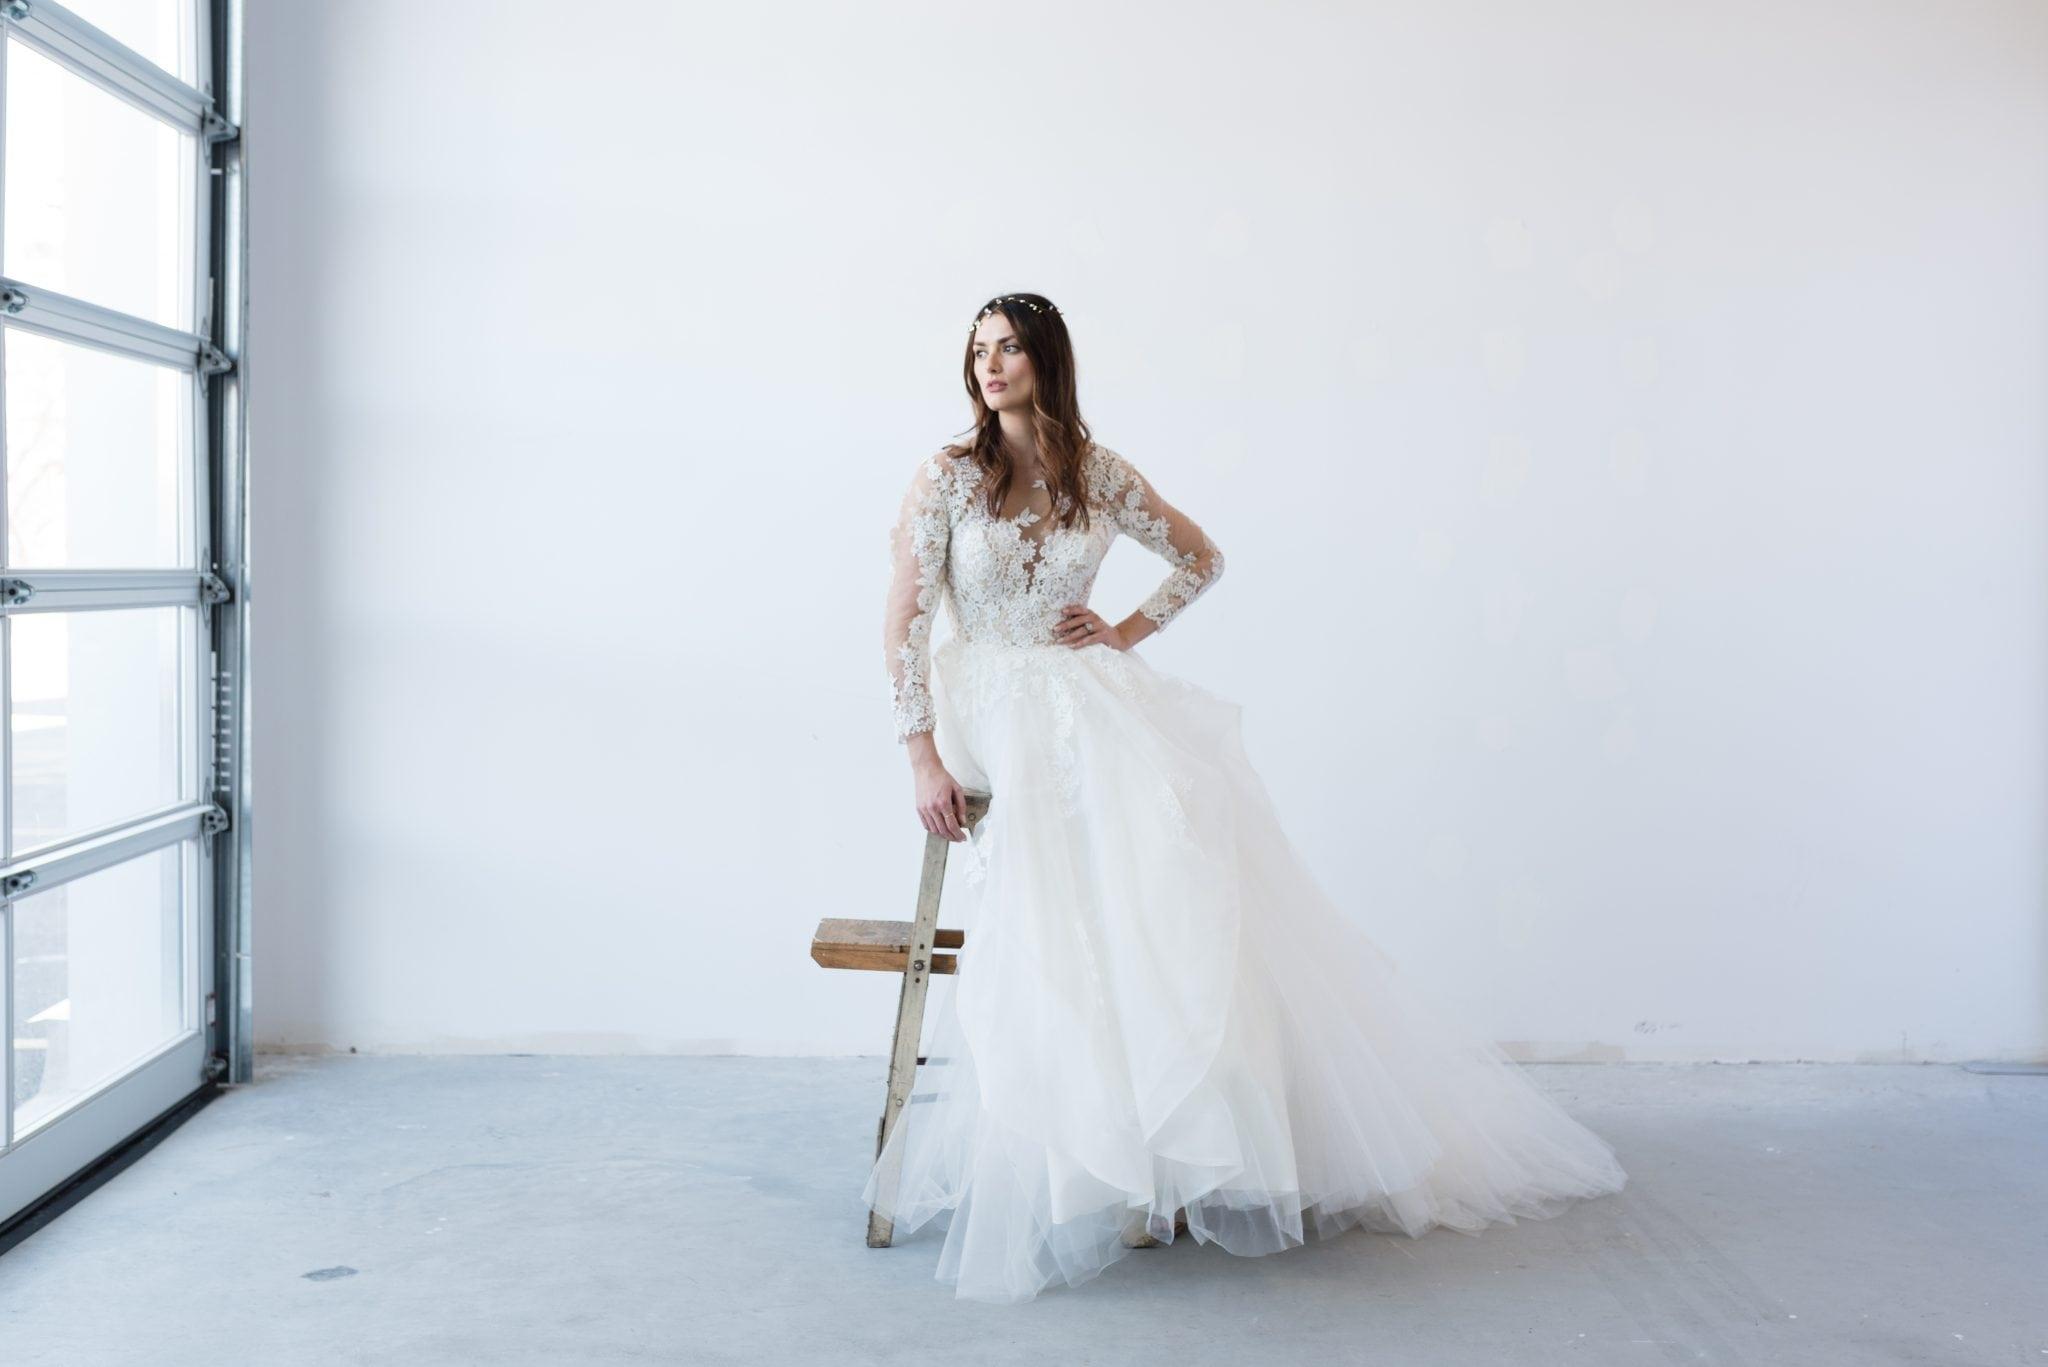 Magasin de robe de mariee ottawa